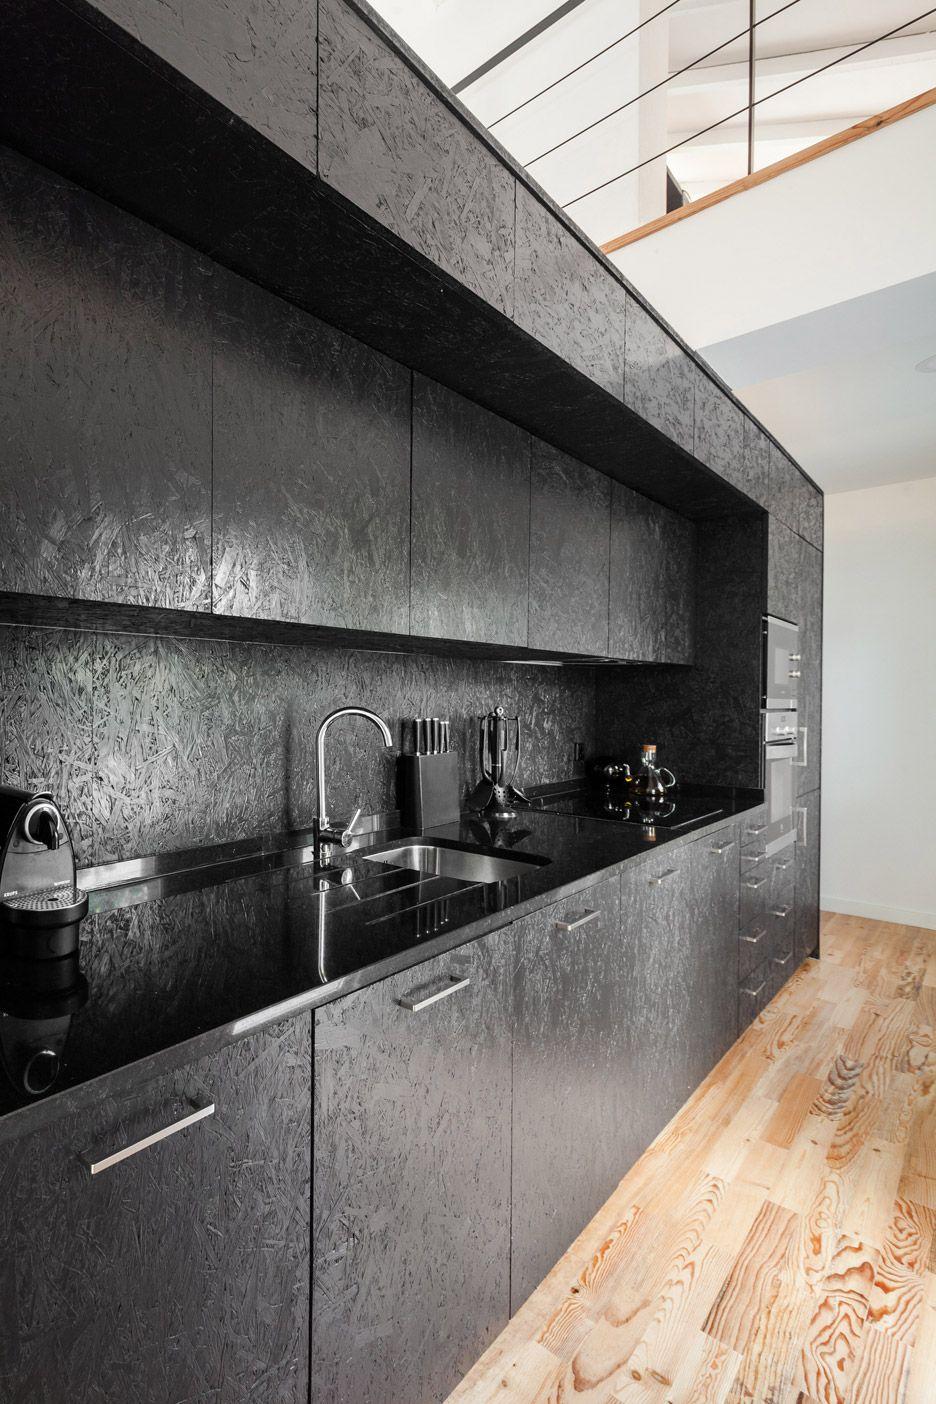 Inês Brandão installs black box of rooms inside converted